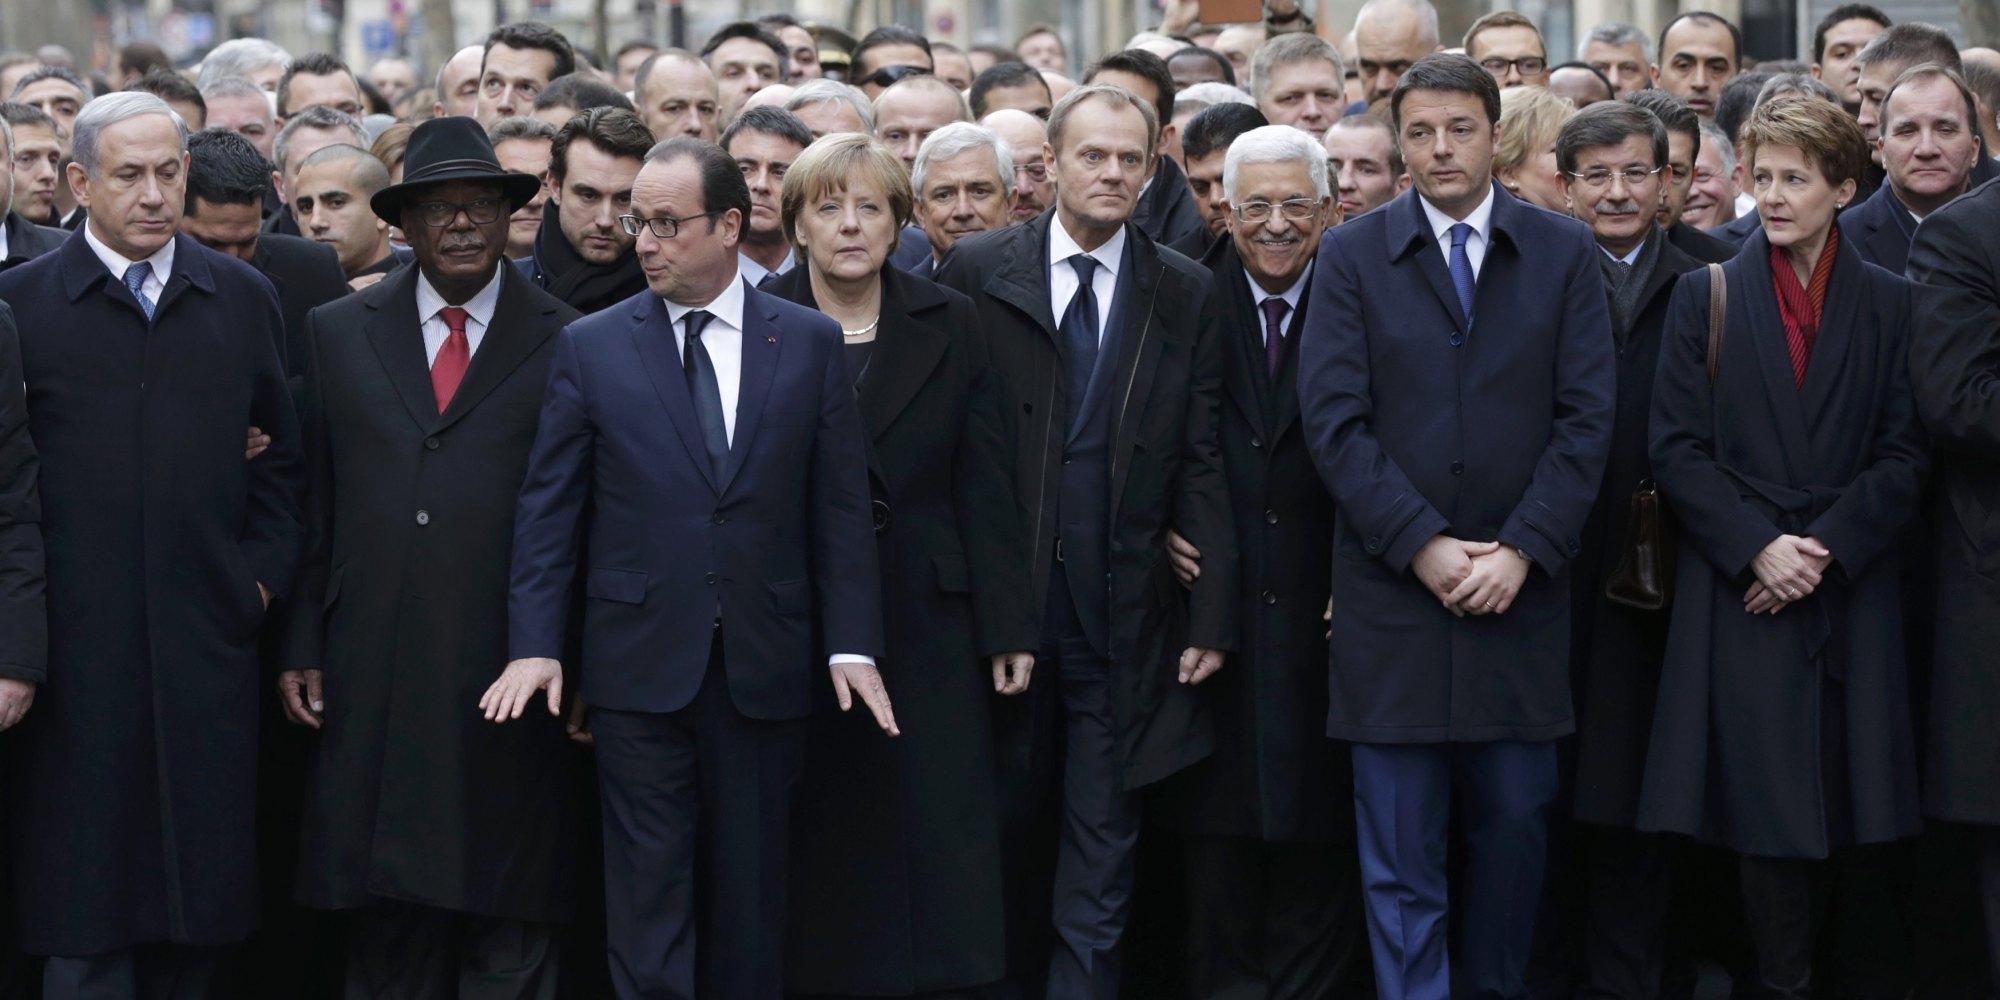 Attentati Parigi, critiche a Barack Obama per l'assenza alla ...